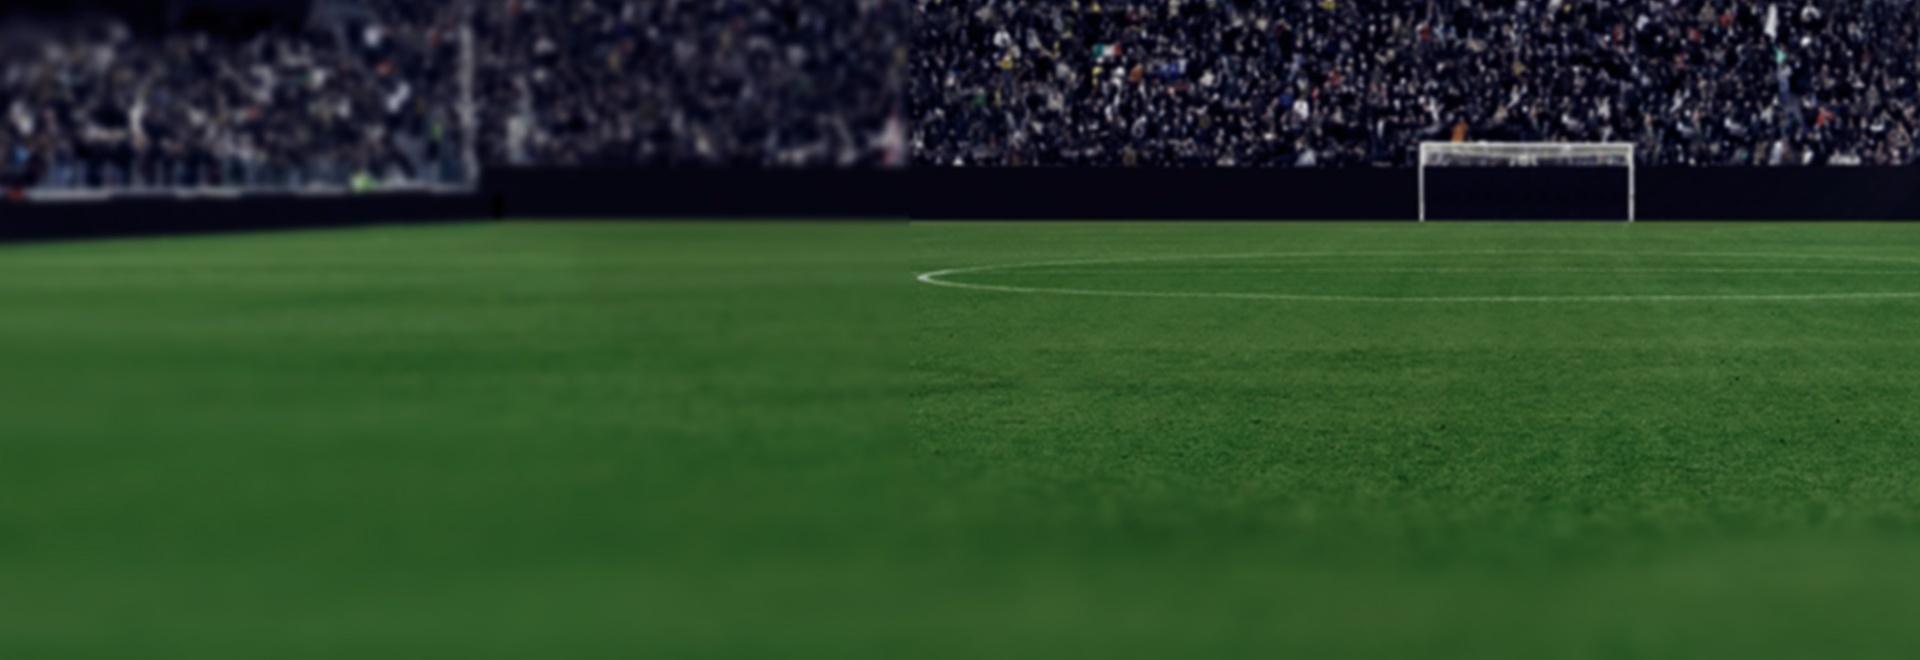 Monday Foot-Gol